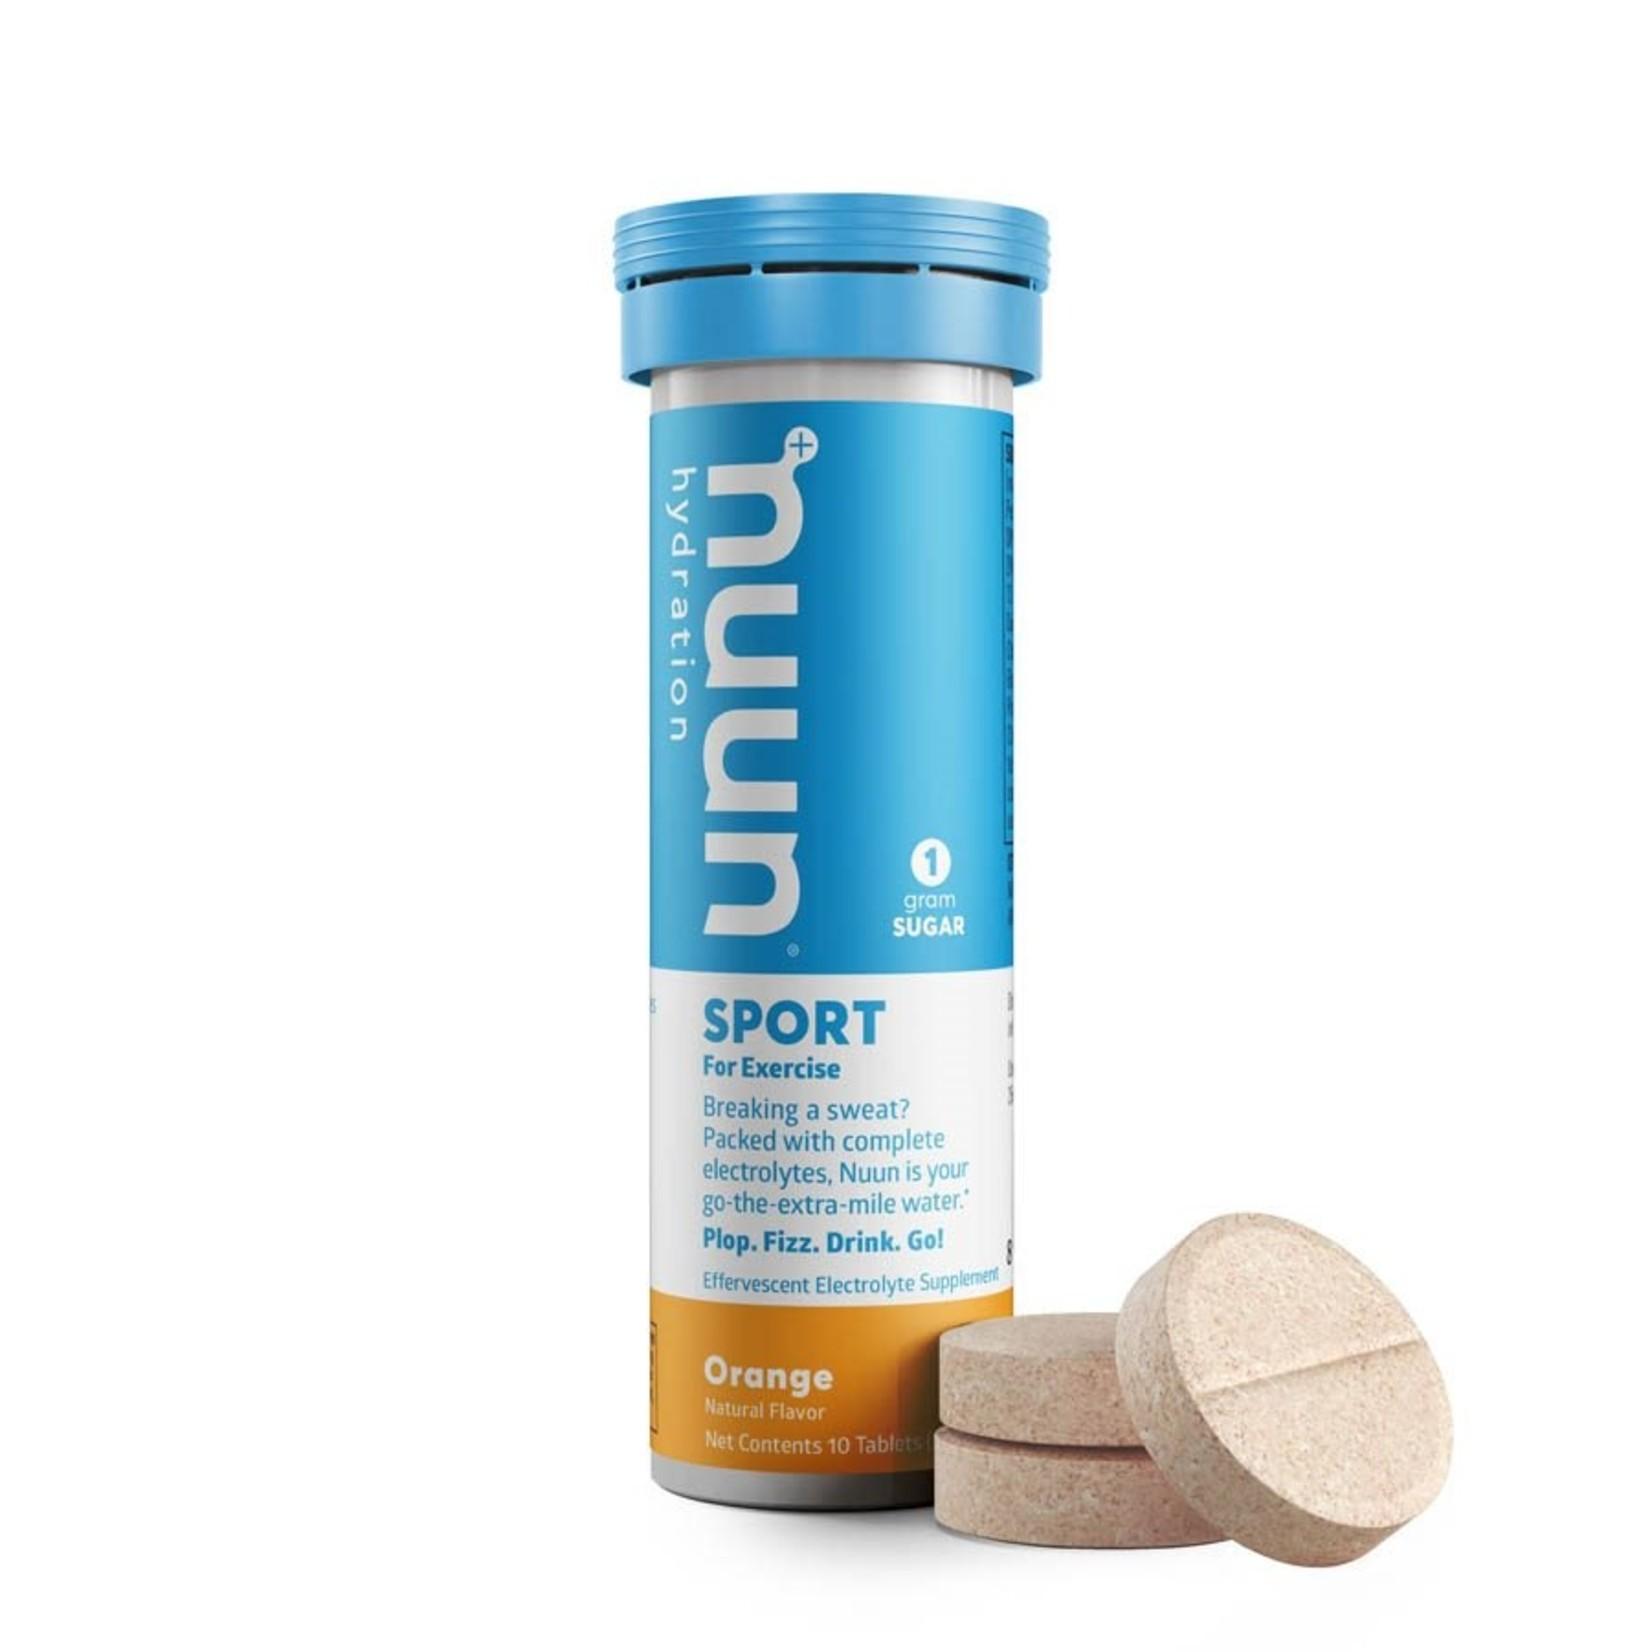 Nuun Nuun Active Tablets (10 tablets), Orange